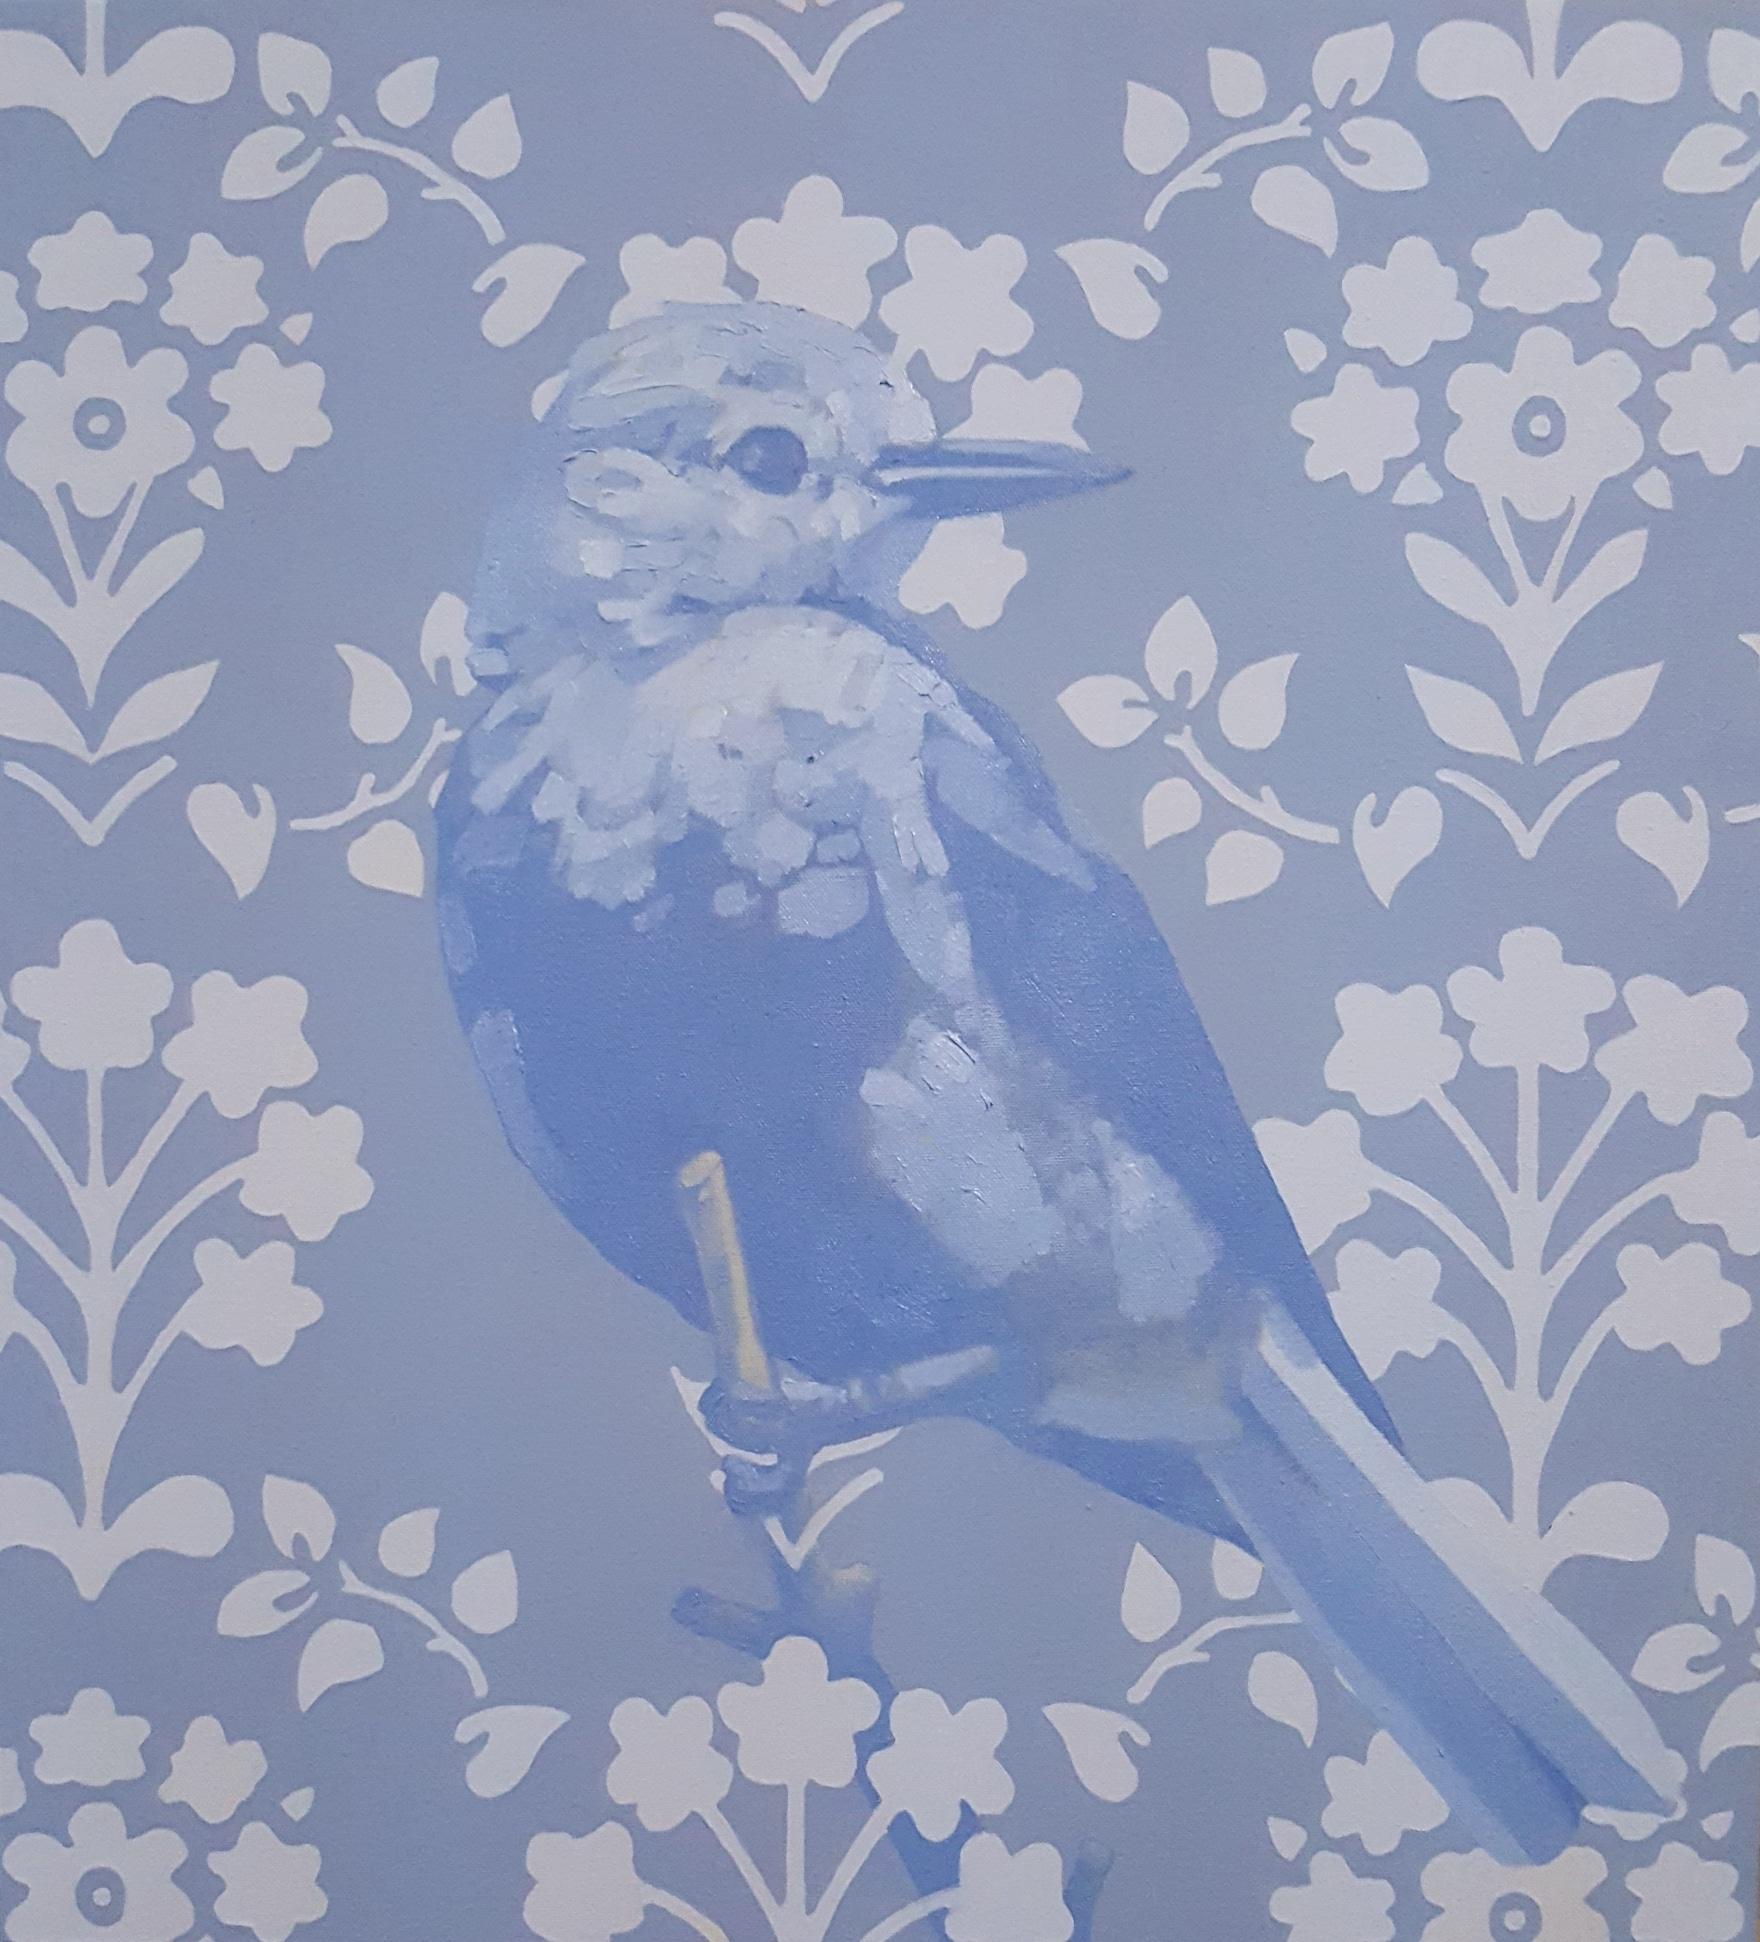 "Haylee Fortin,  Clark's Nutcracker, 24x30"", Oil and acrylic on canvas"